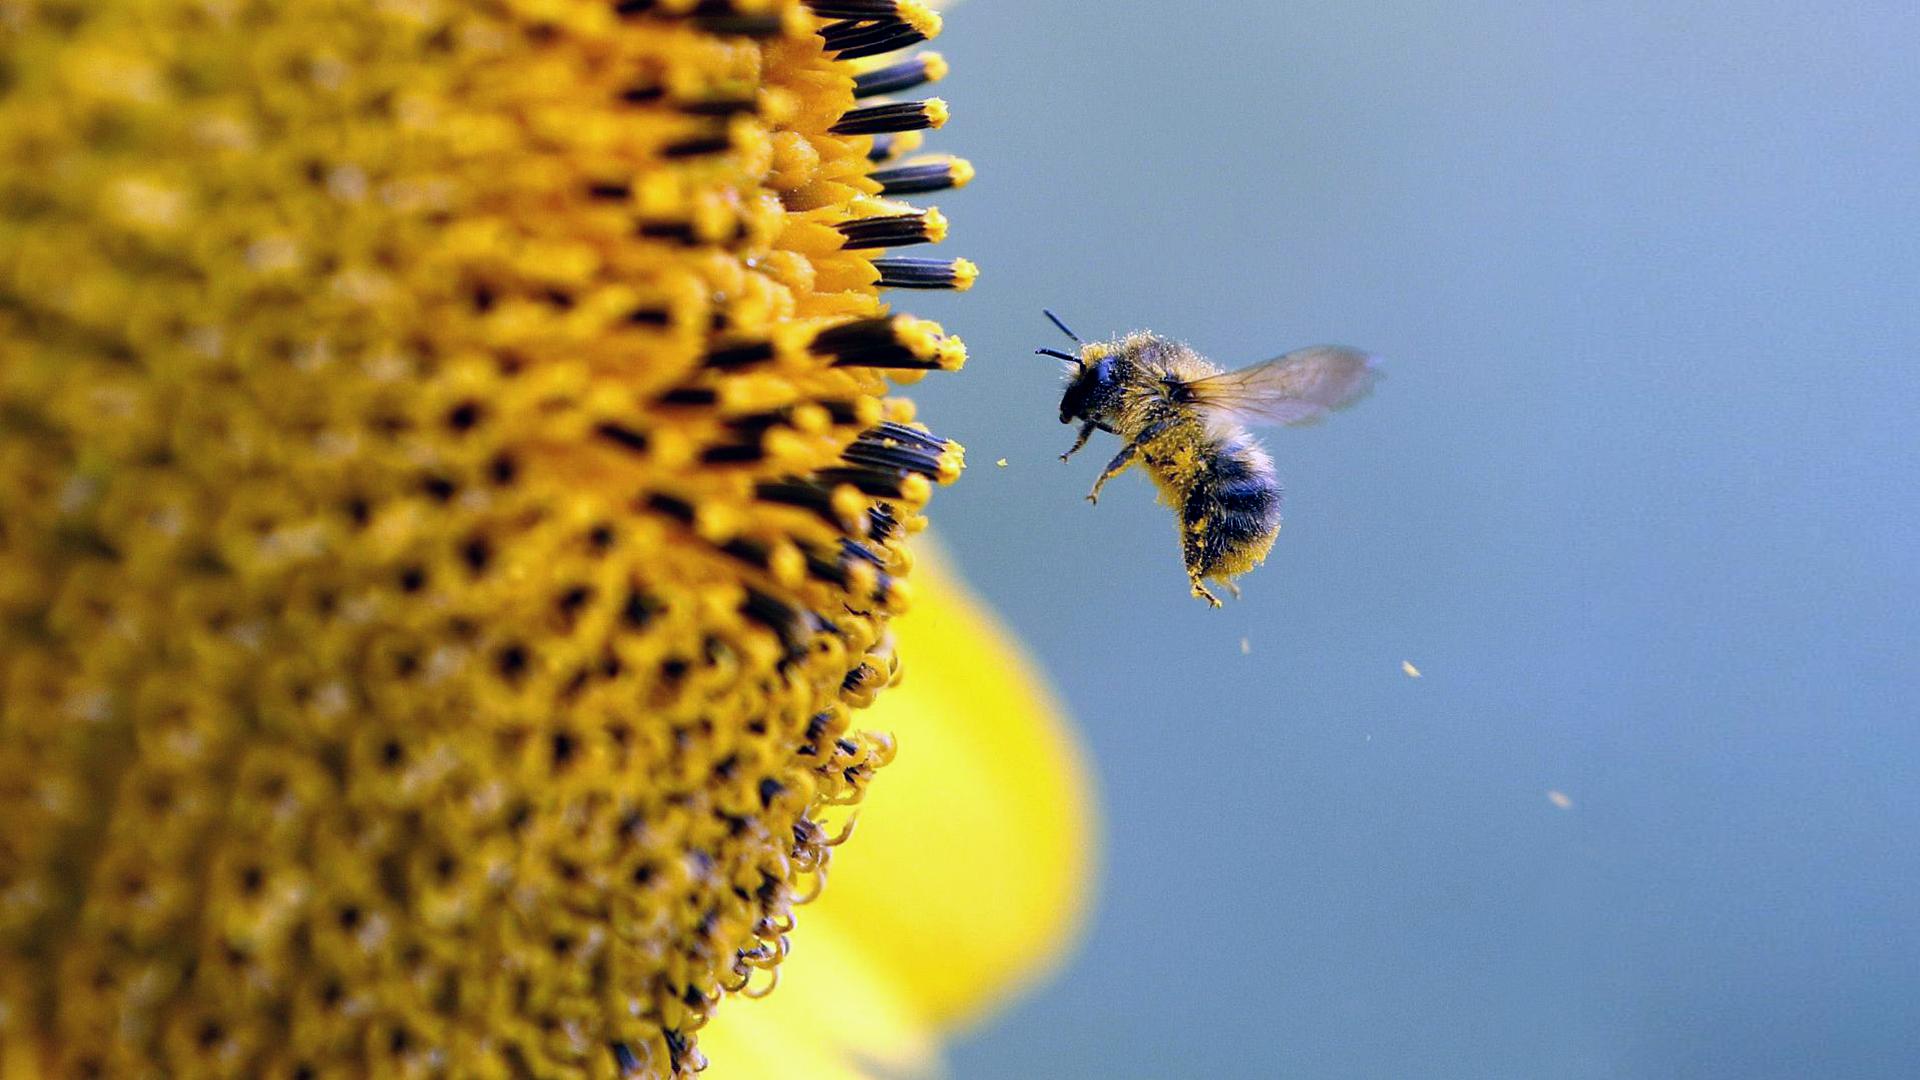 Bee Hd Wallpaper Background Image 1920x1080 Id